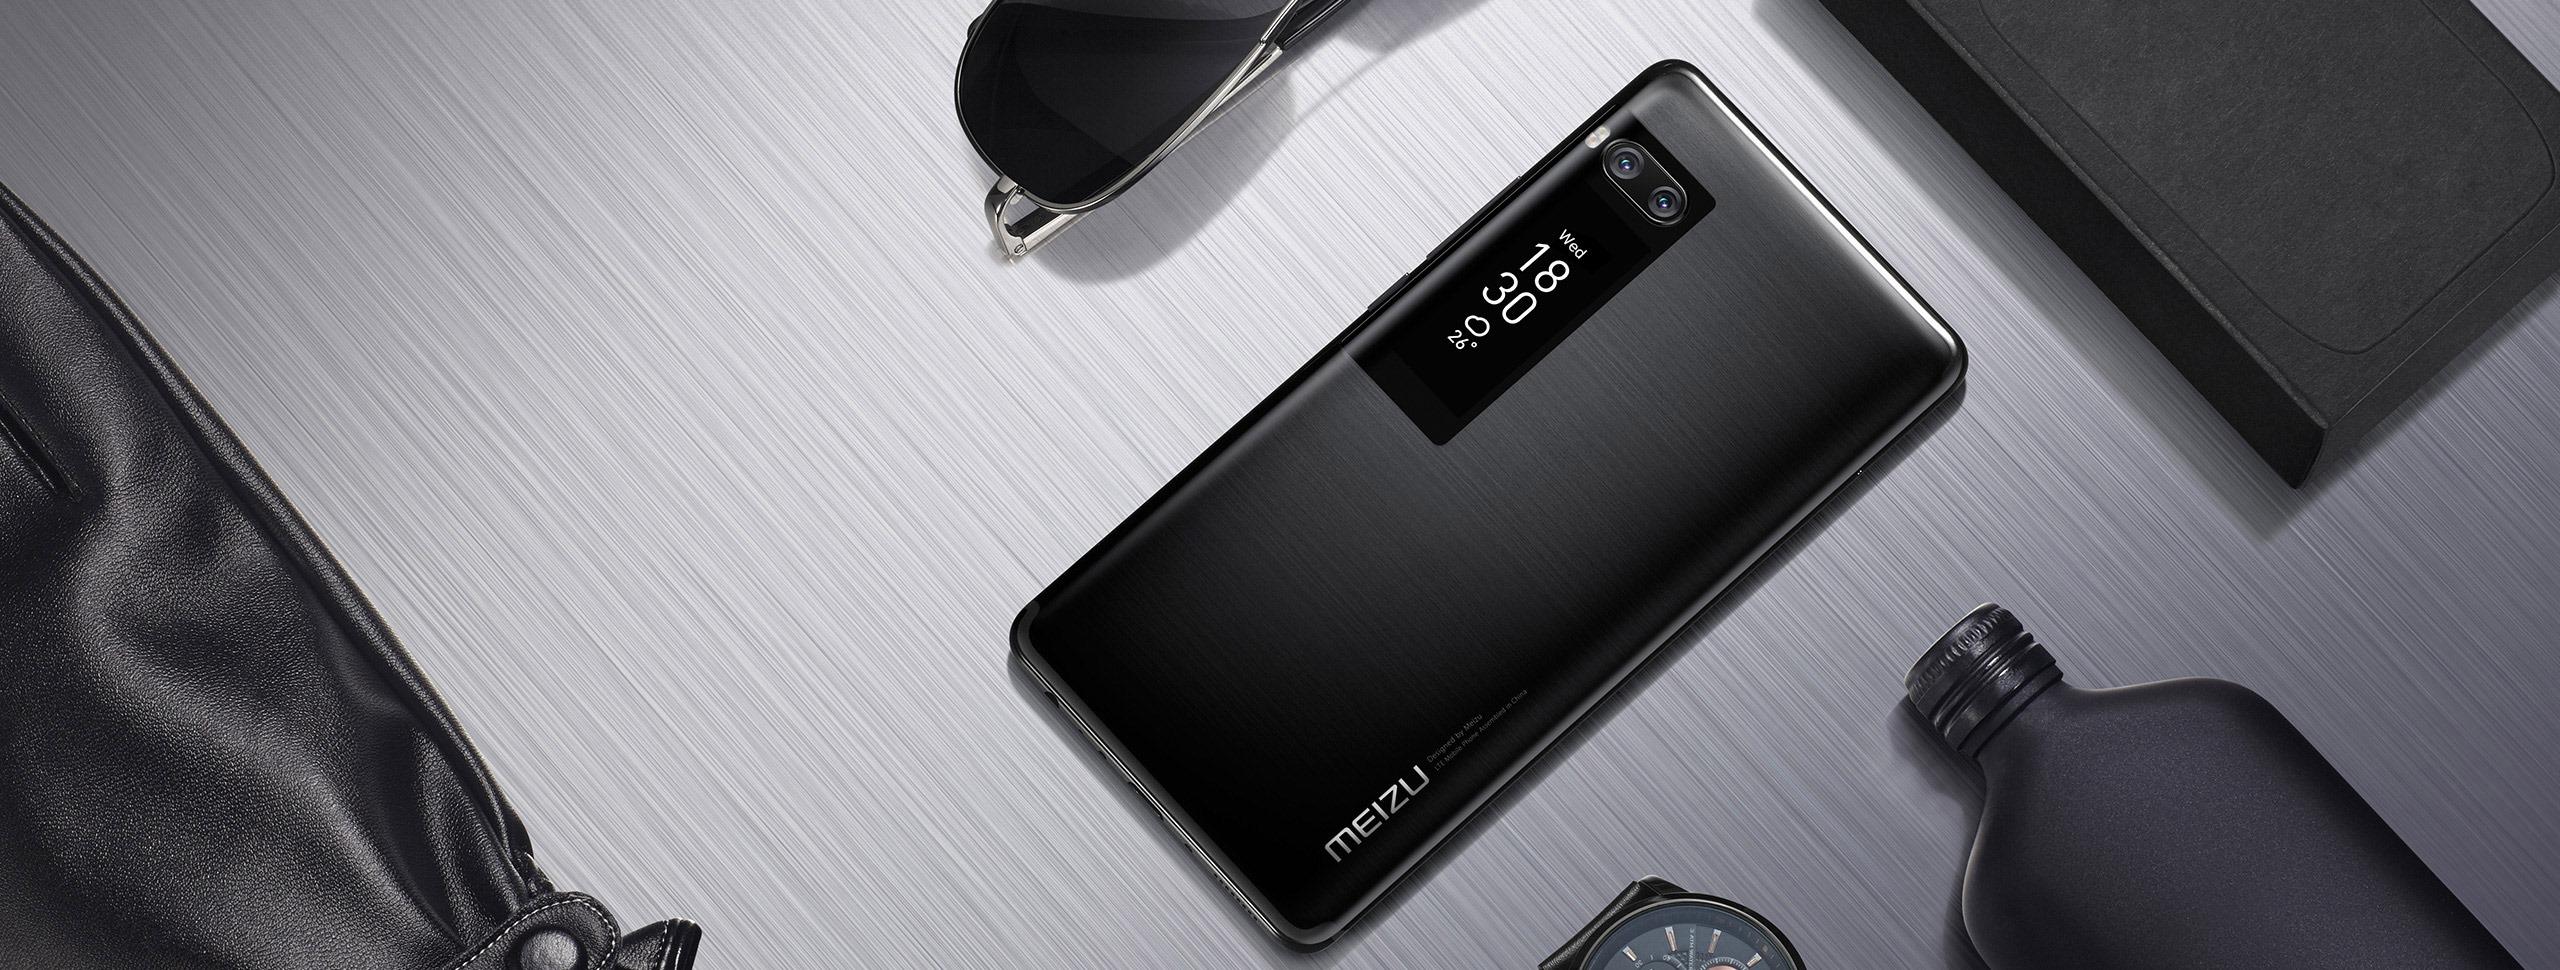 Meizu Pro 7 Plus (10)